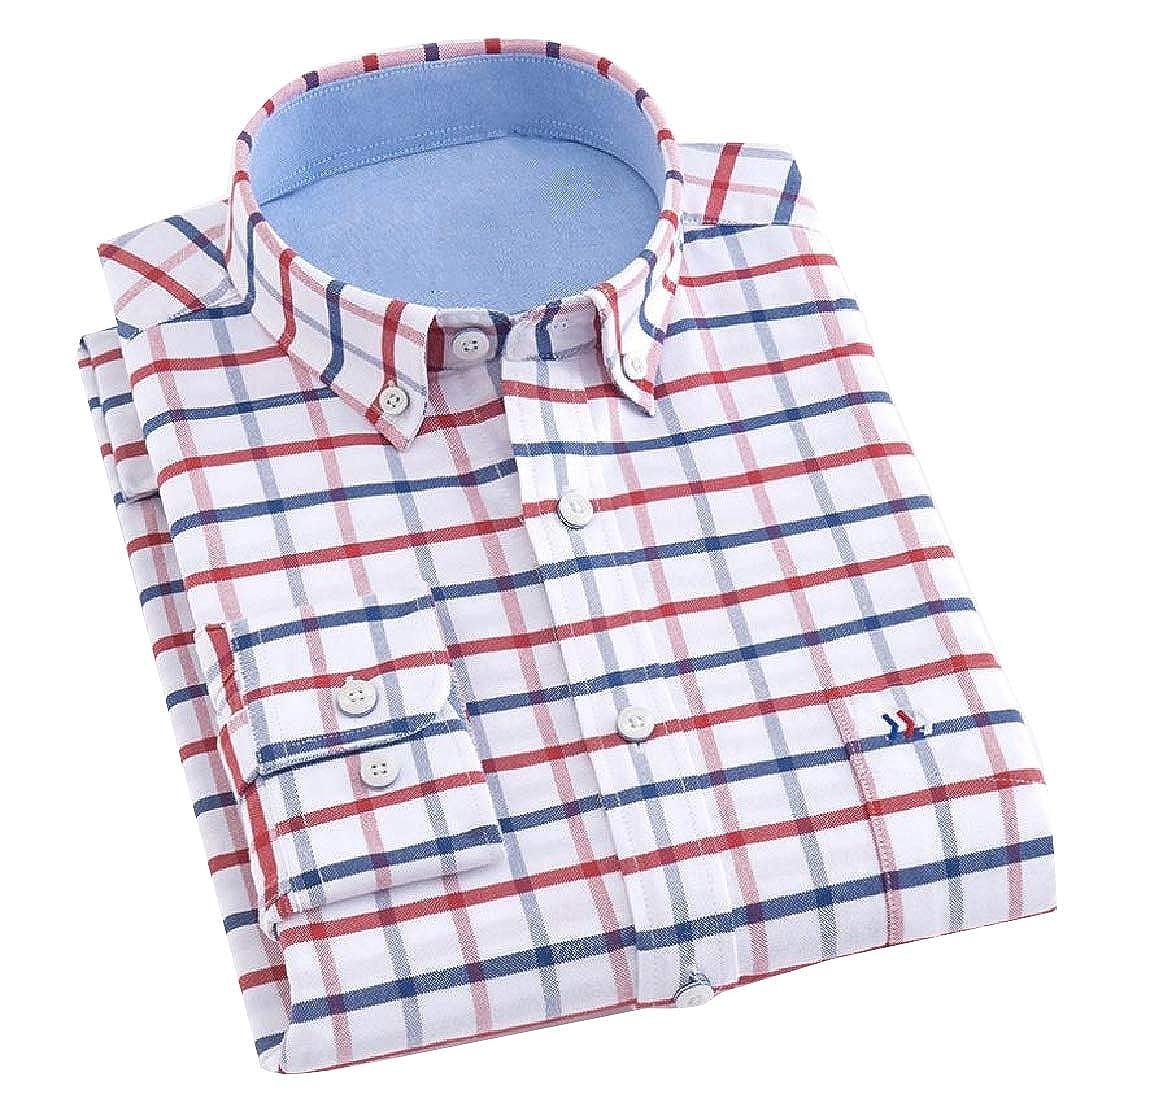 YUNY Mens Long-Sleeve Plaid Cozy Formal Classic Oxford Poplin Shirt 27 2XL